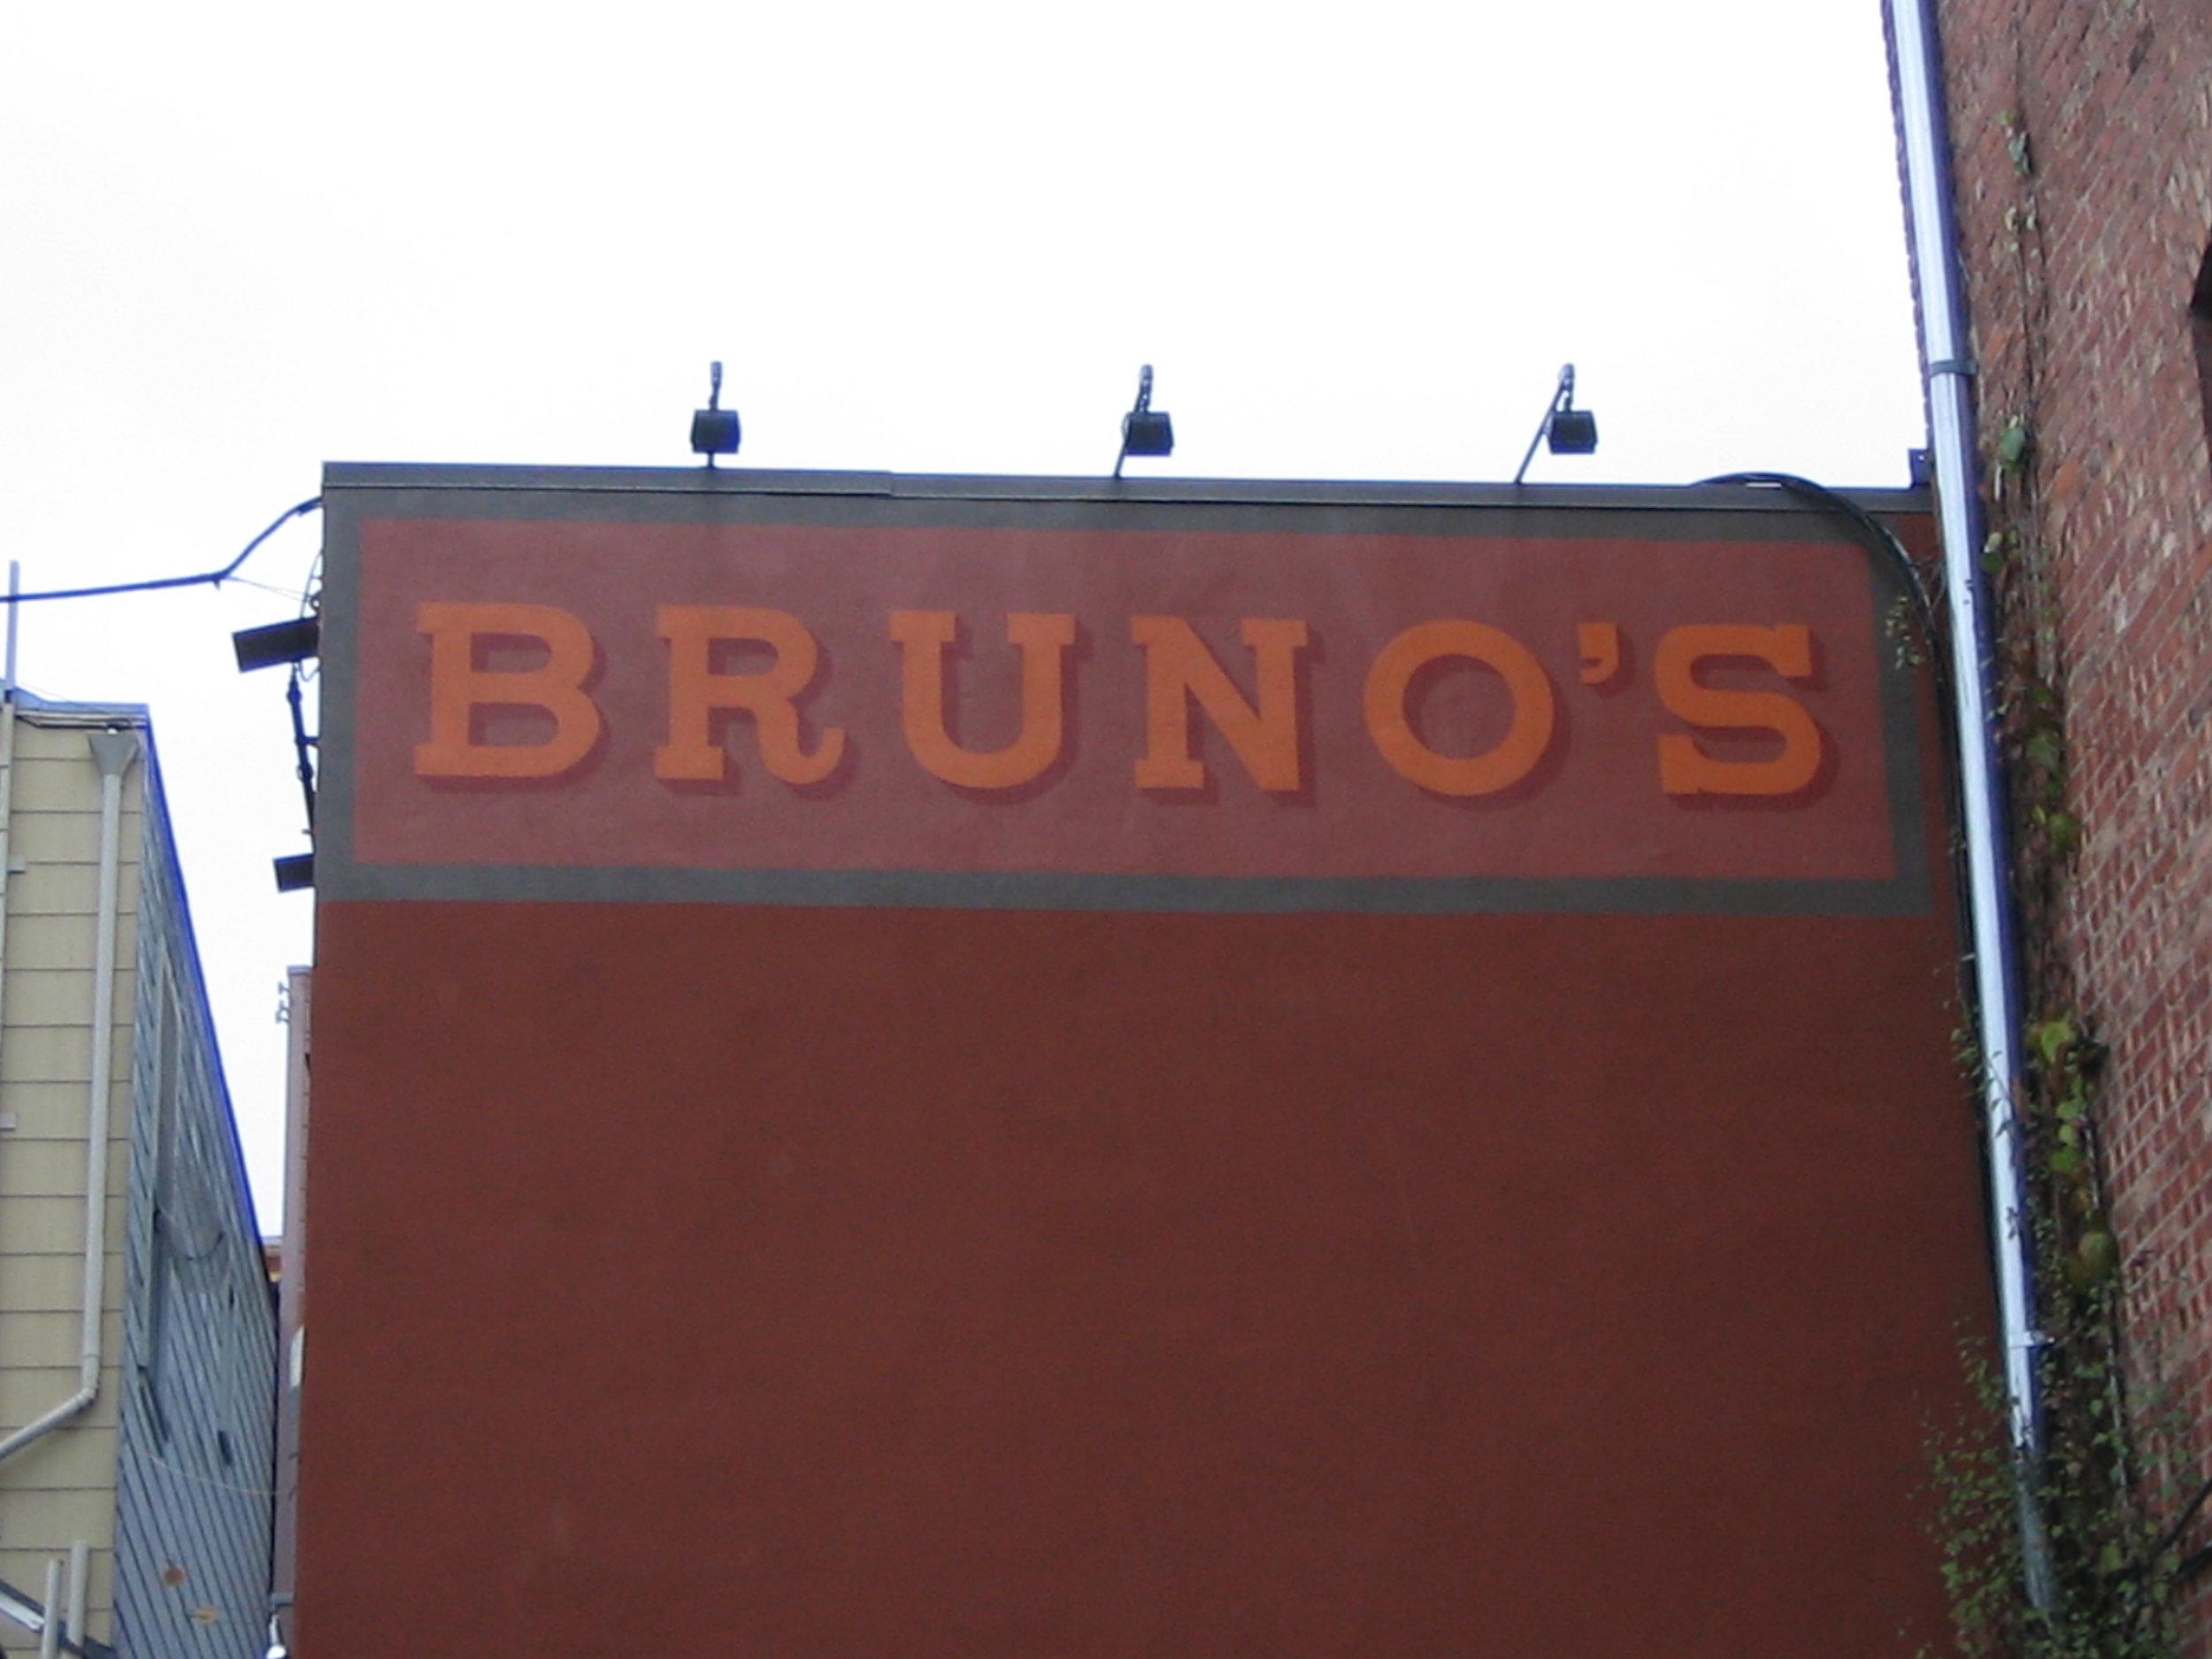 HAND-brunos_3161940724_o.jpg